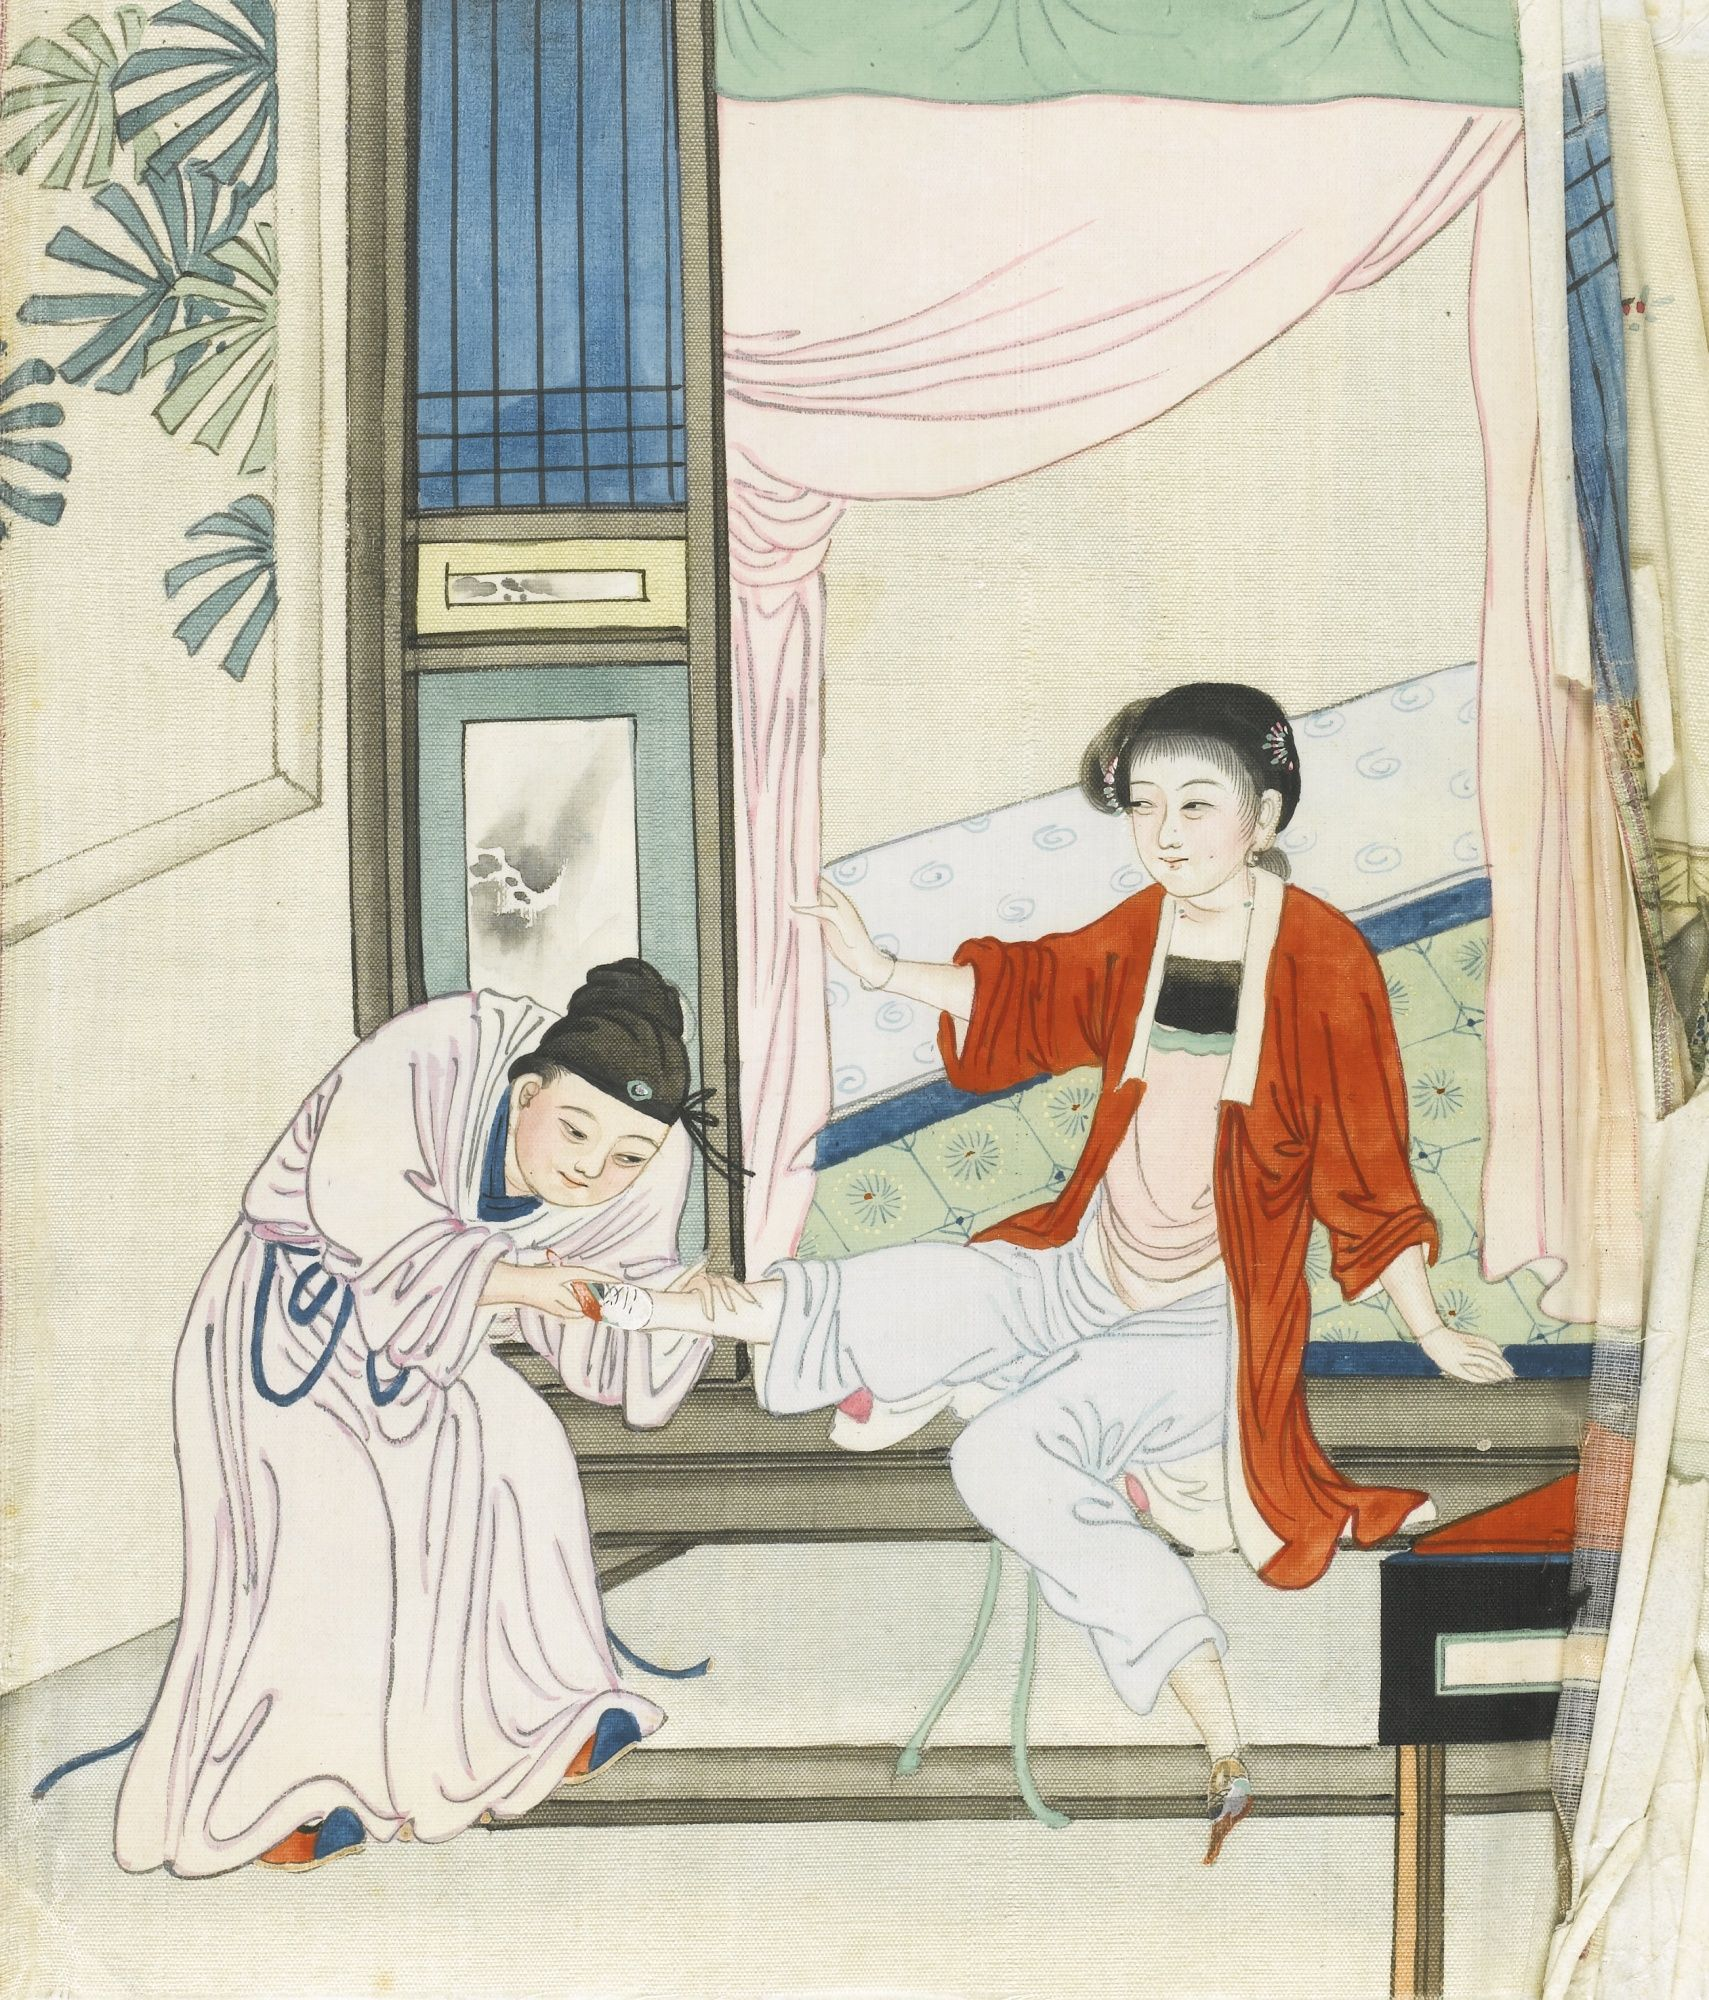 Erotic china paintings